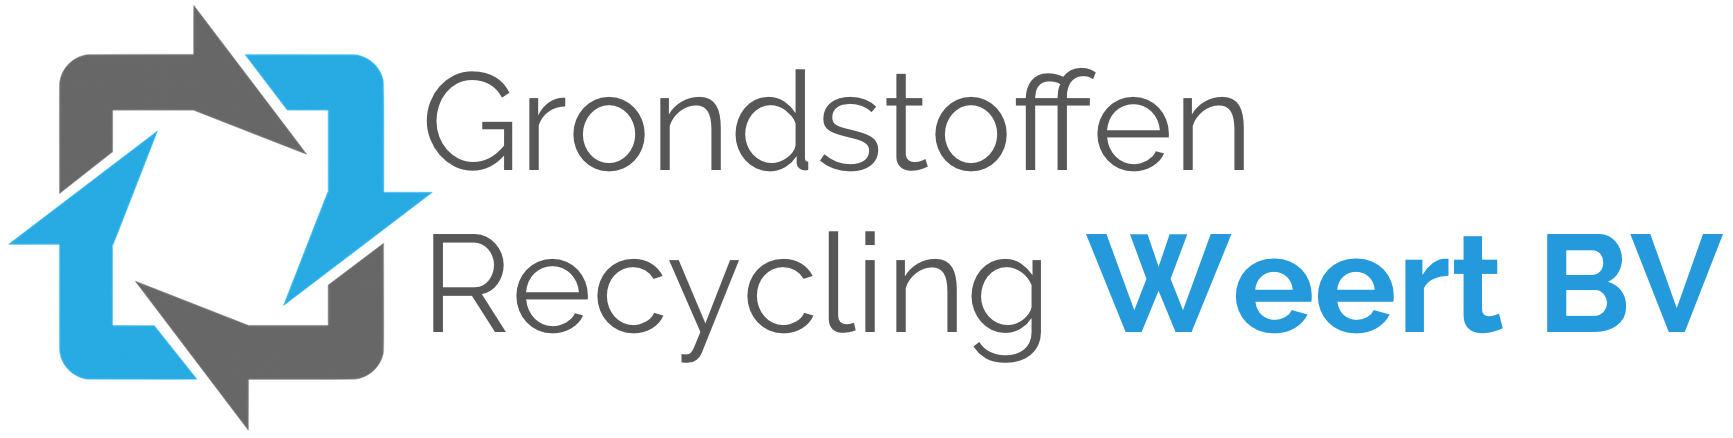 Grondstoffen Recycling Weert BV